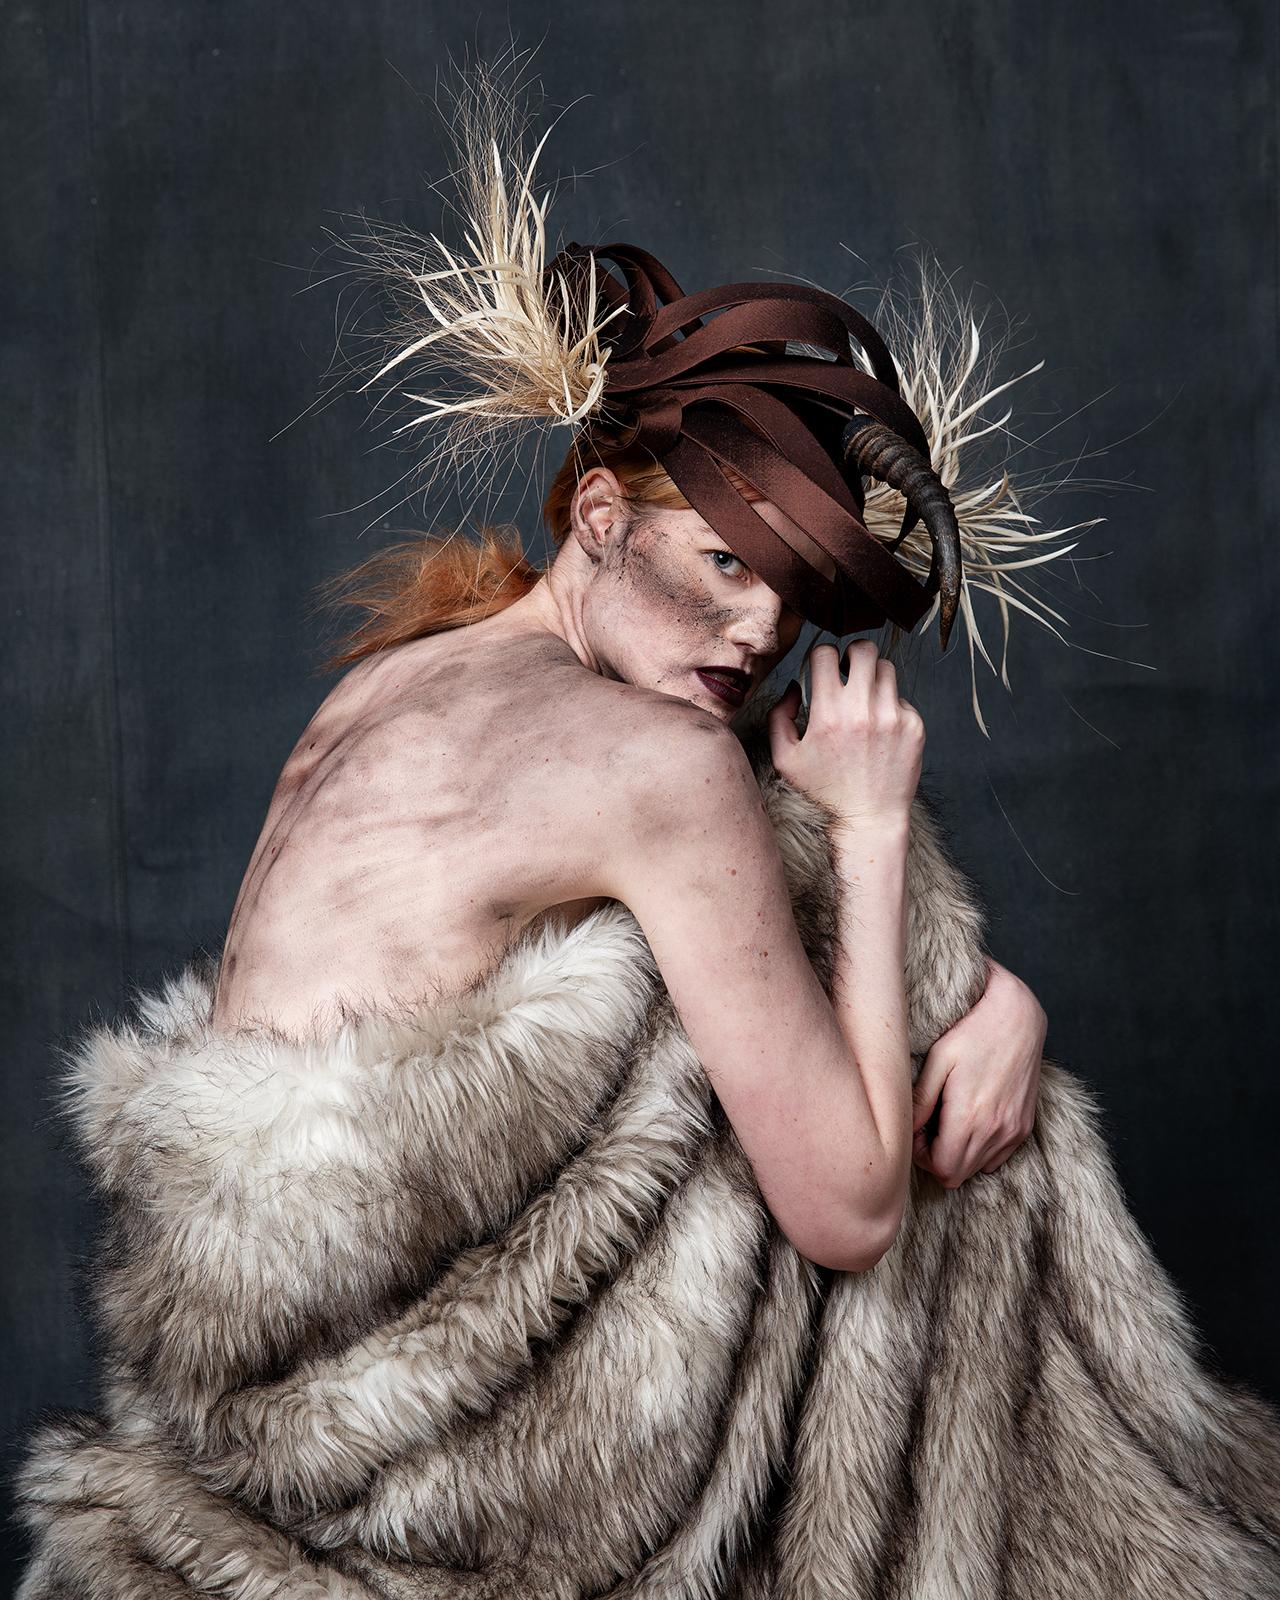 mark_and_naomi_toronto_fashion_photography_david_dunkley_dirty_horn_iv.jpg